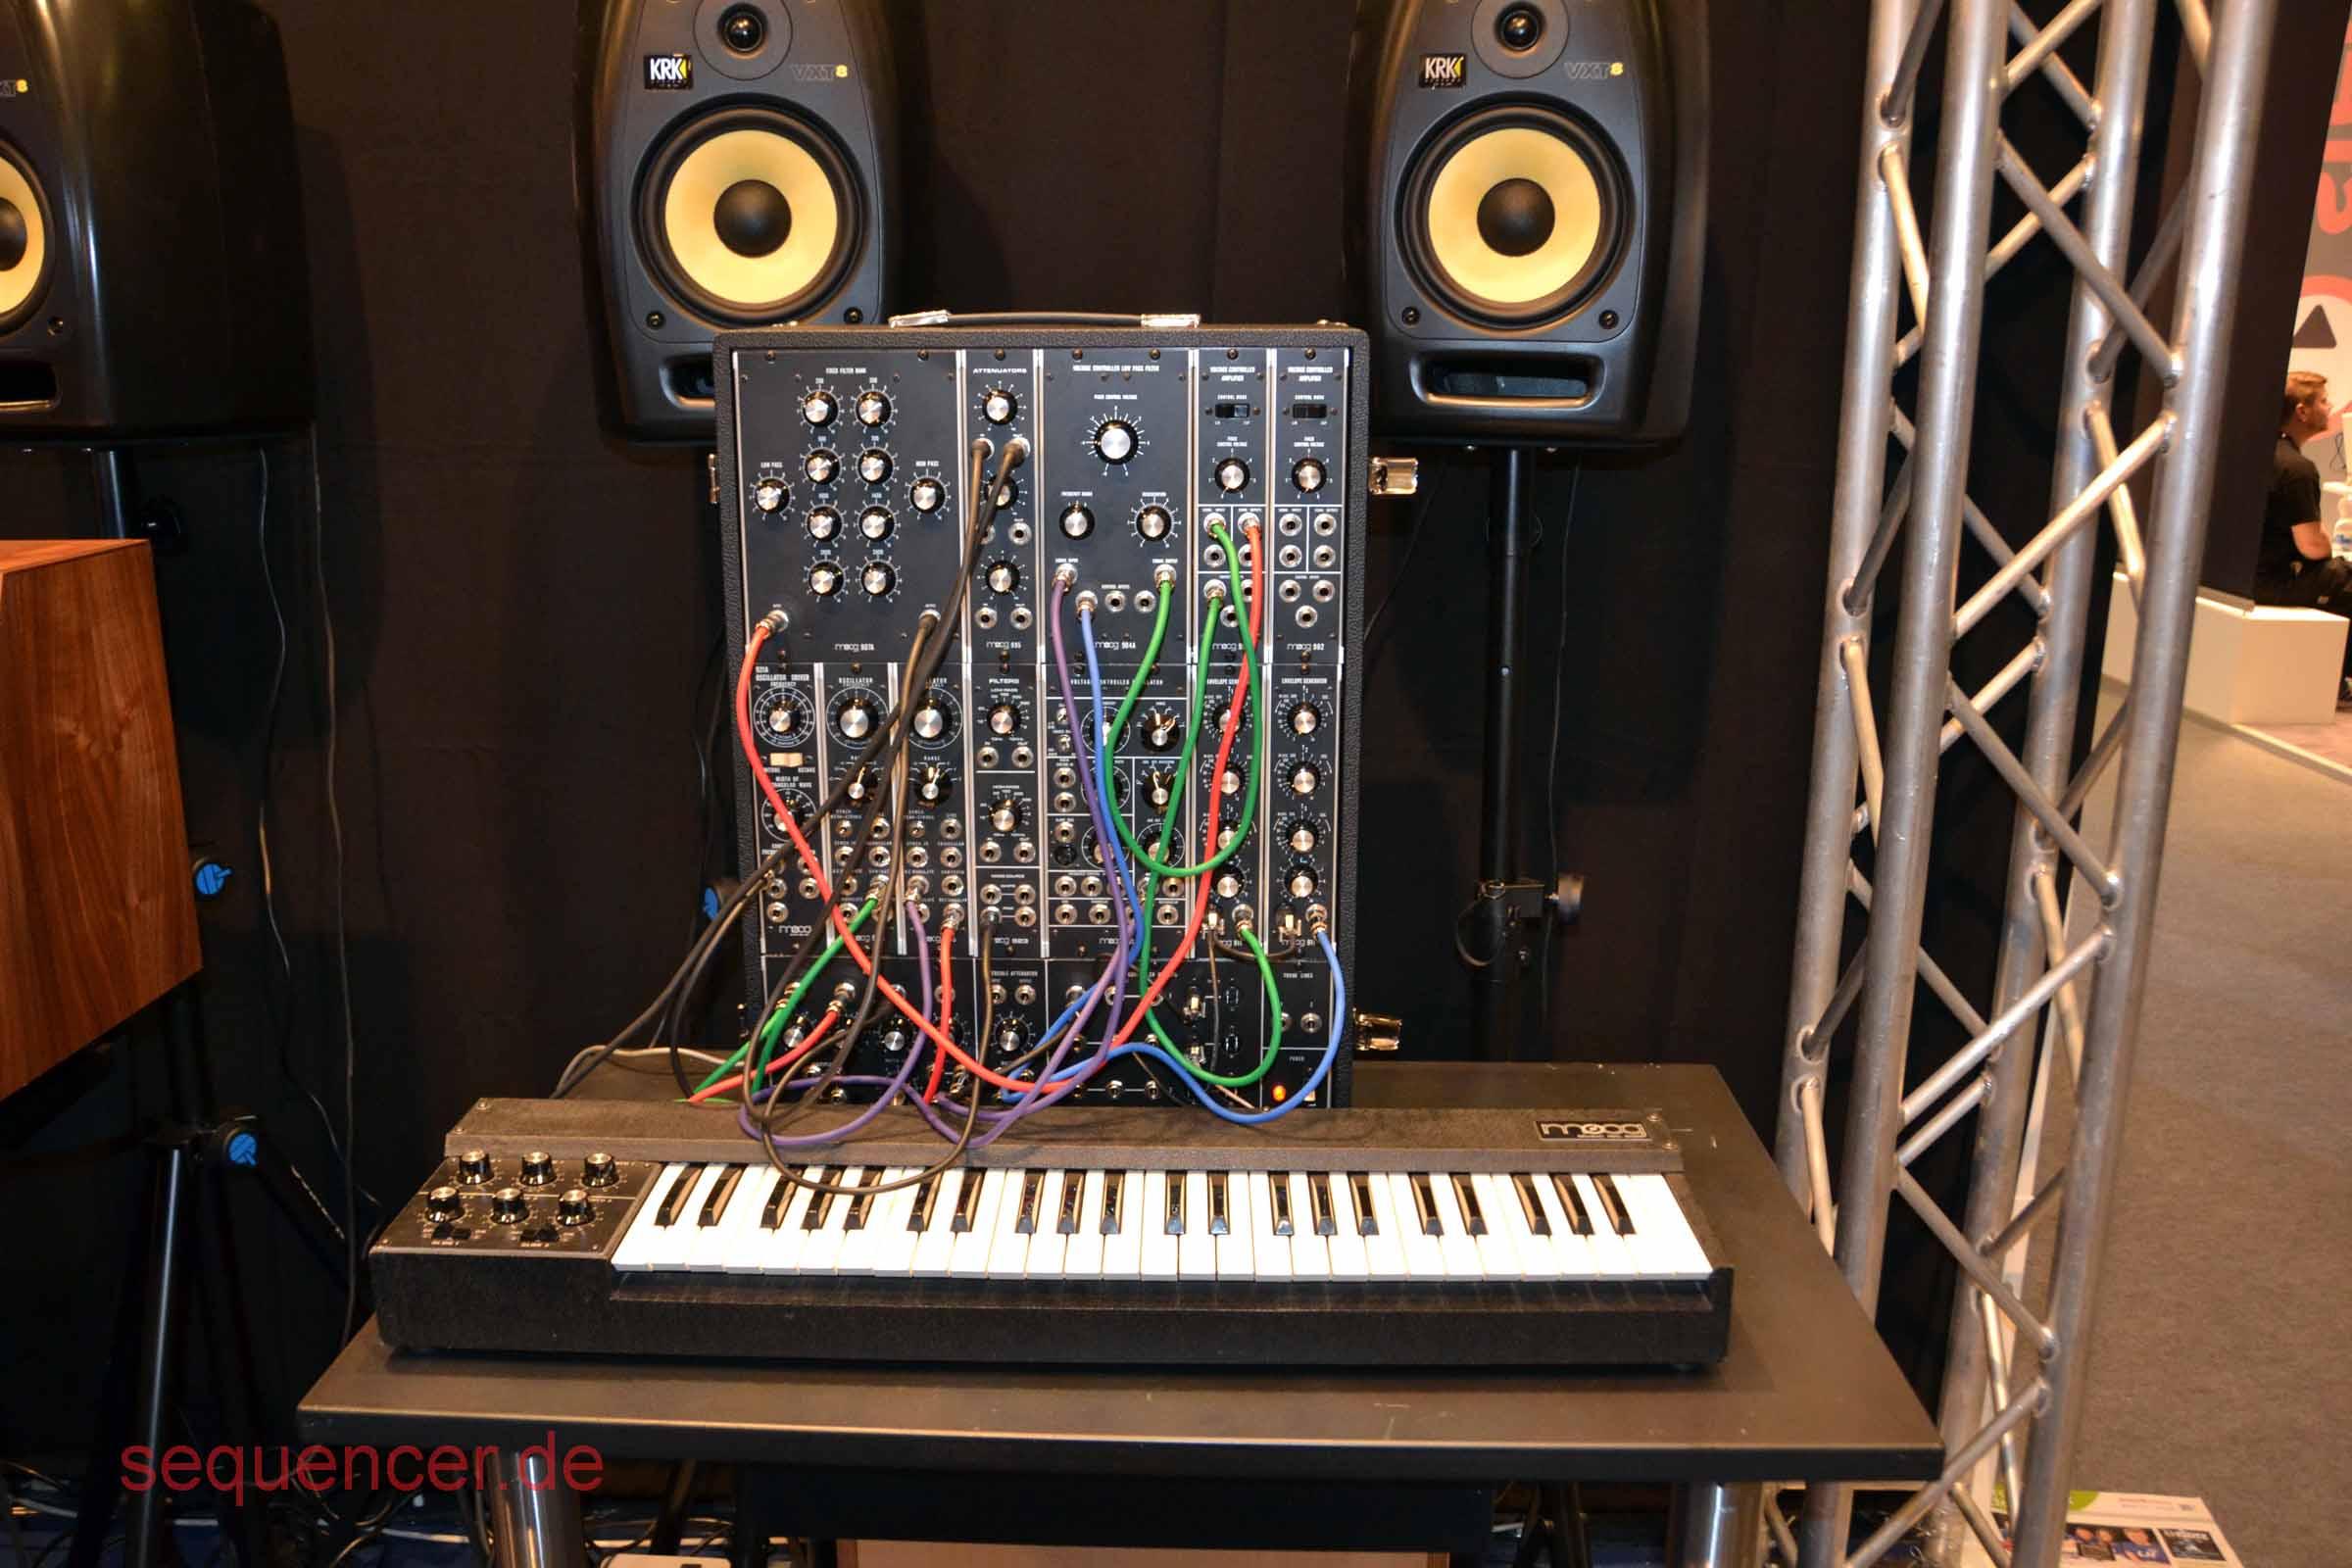 Moog System 15 - re-release 2014/15 Moog System 15 - re-release 2014/15 synthesizer